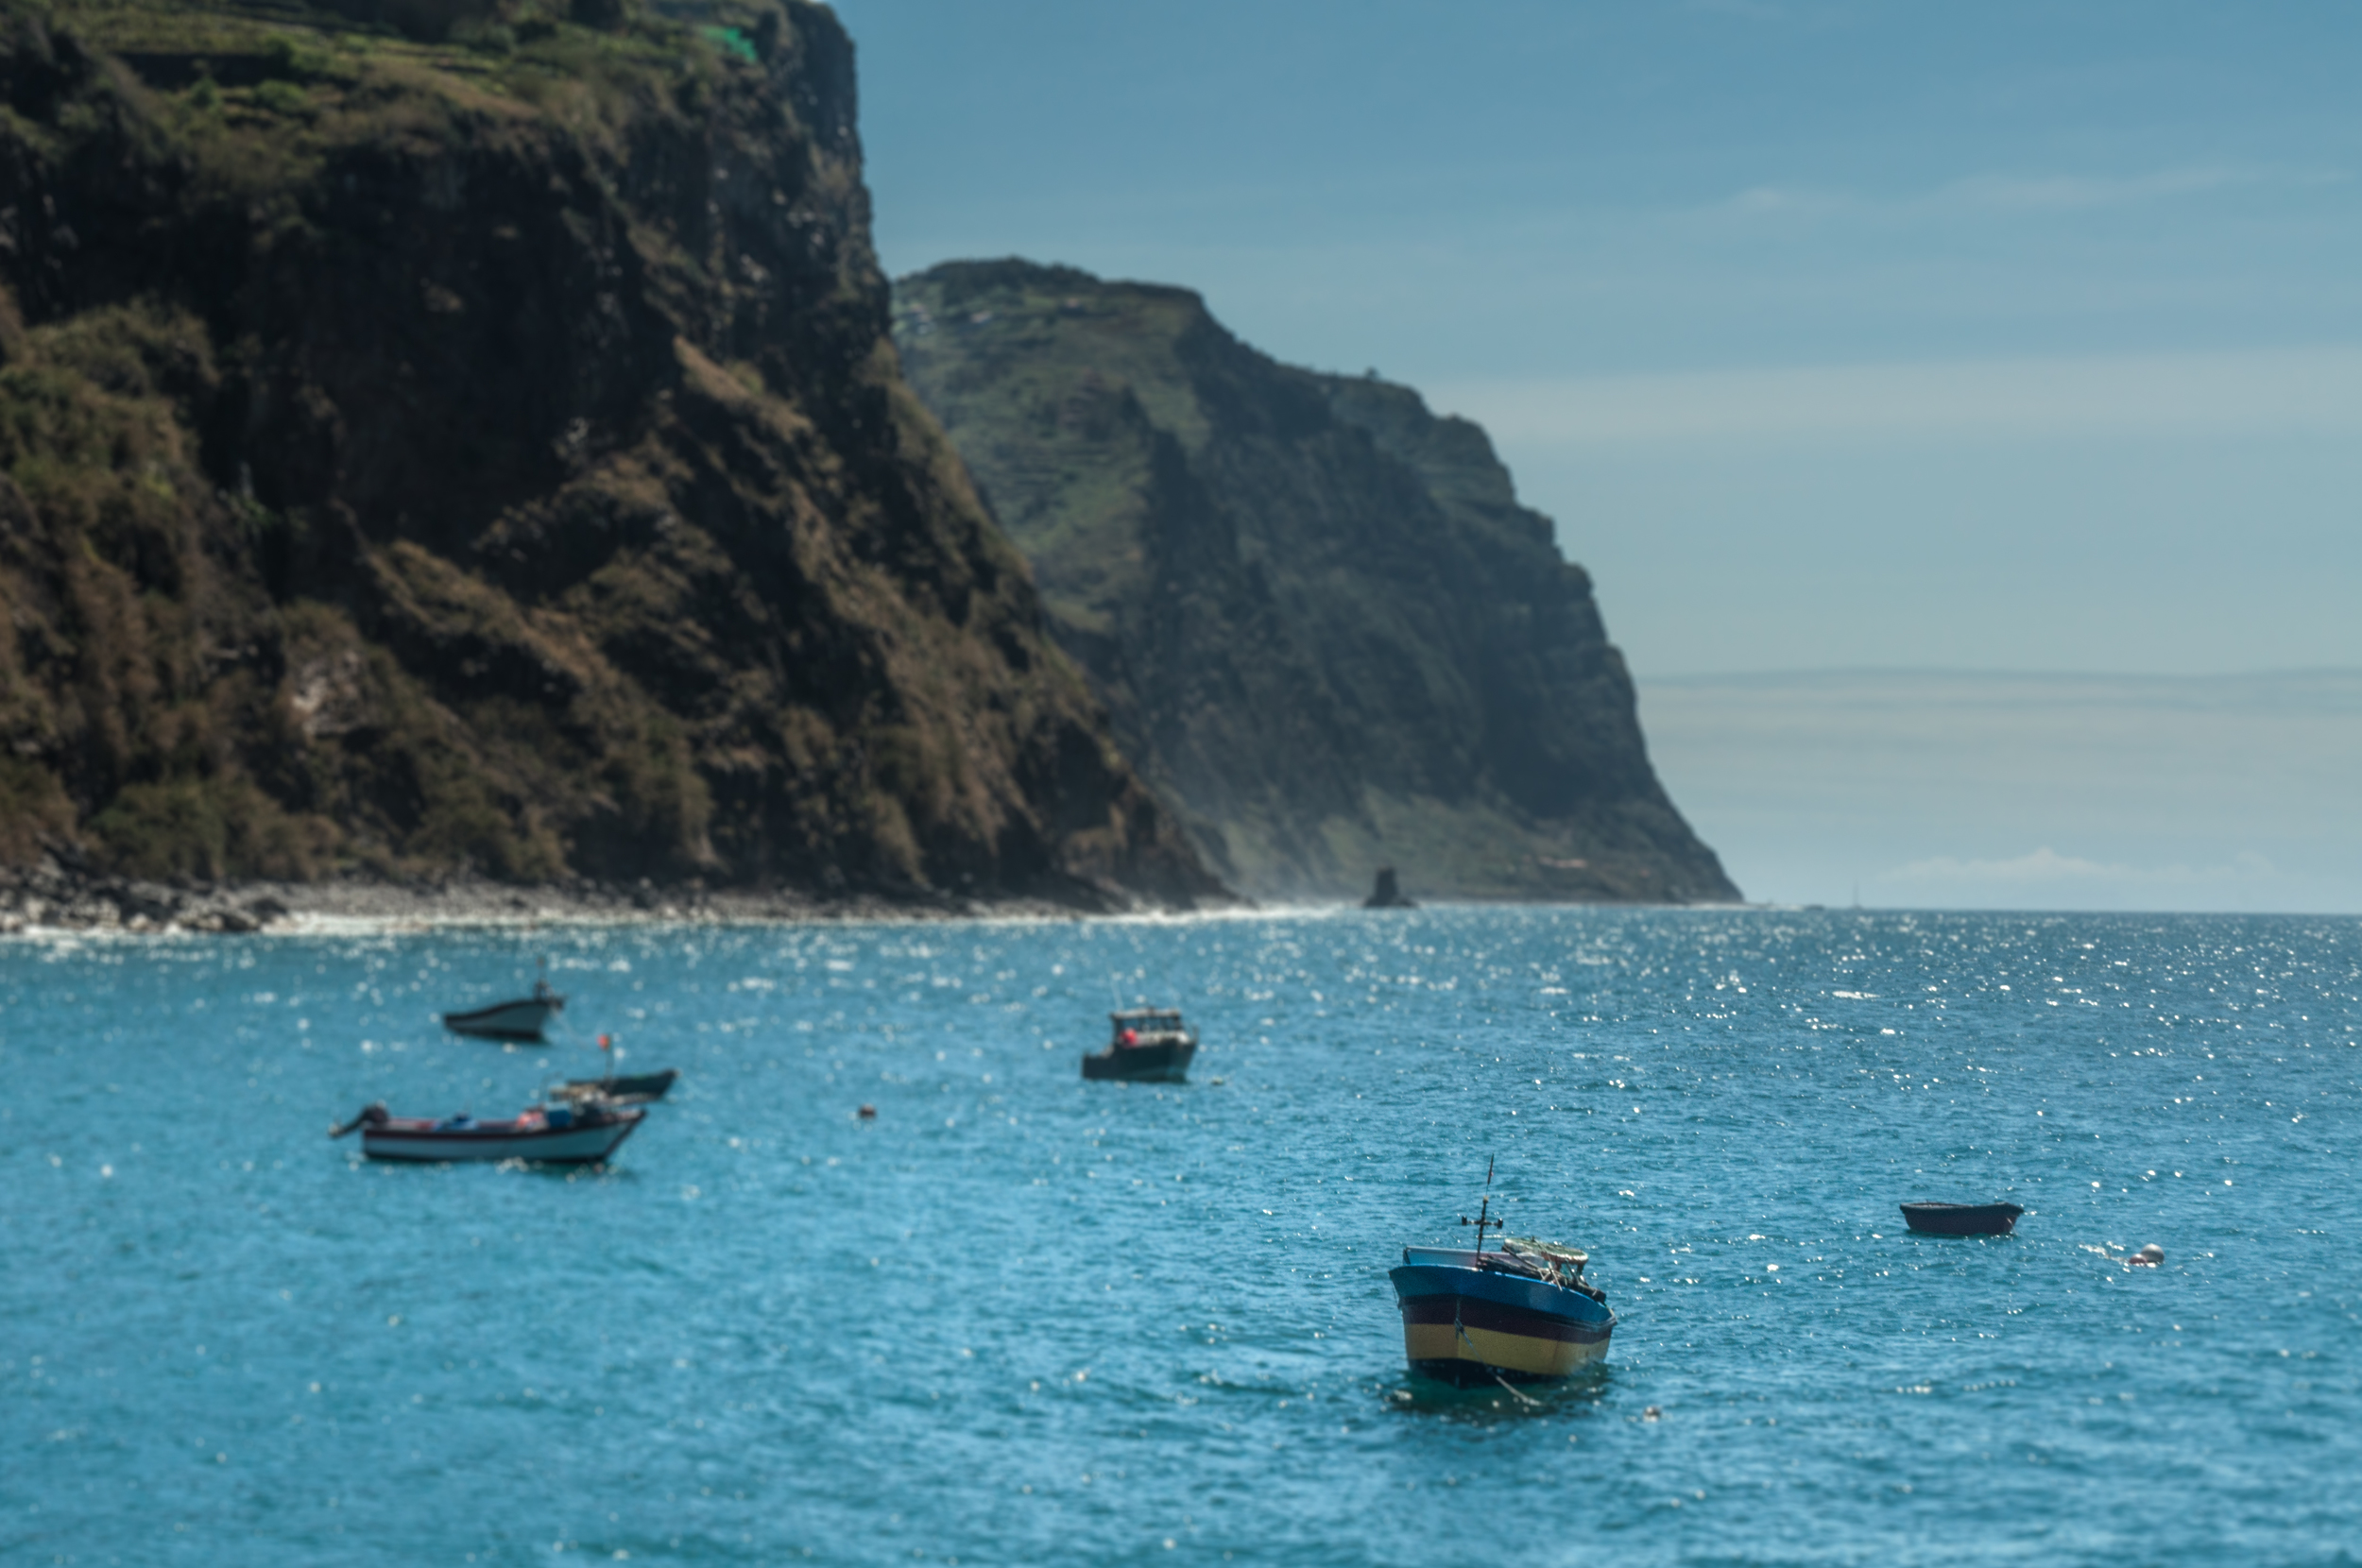 Widki na ocean Madera - 150424 - DSC_4066.JPG